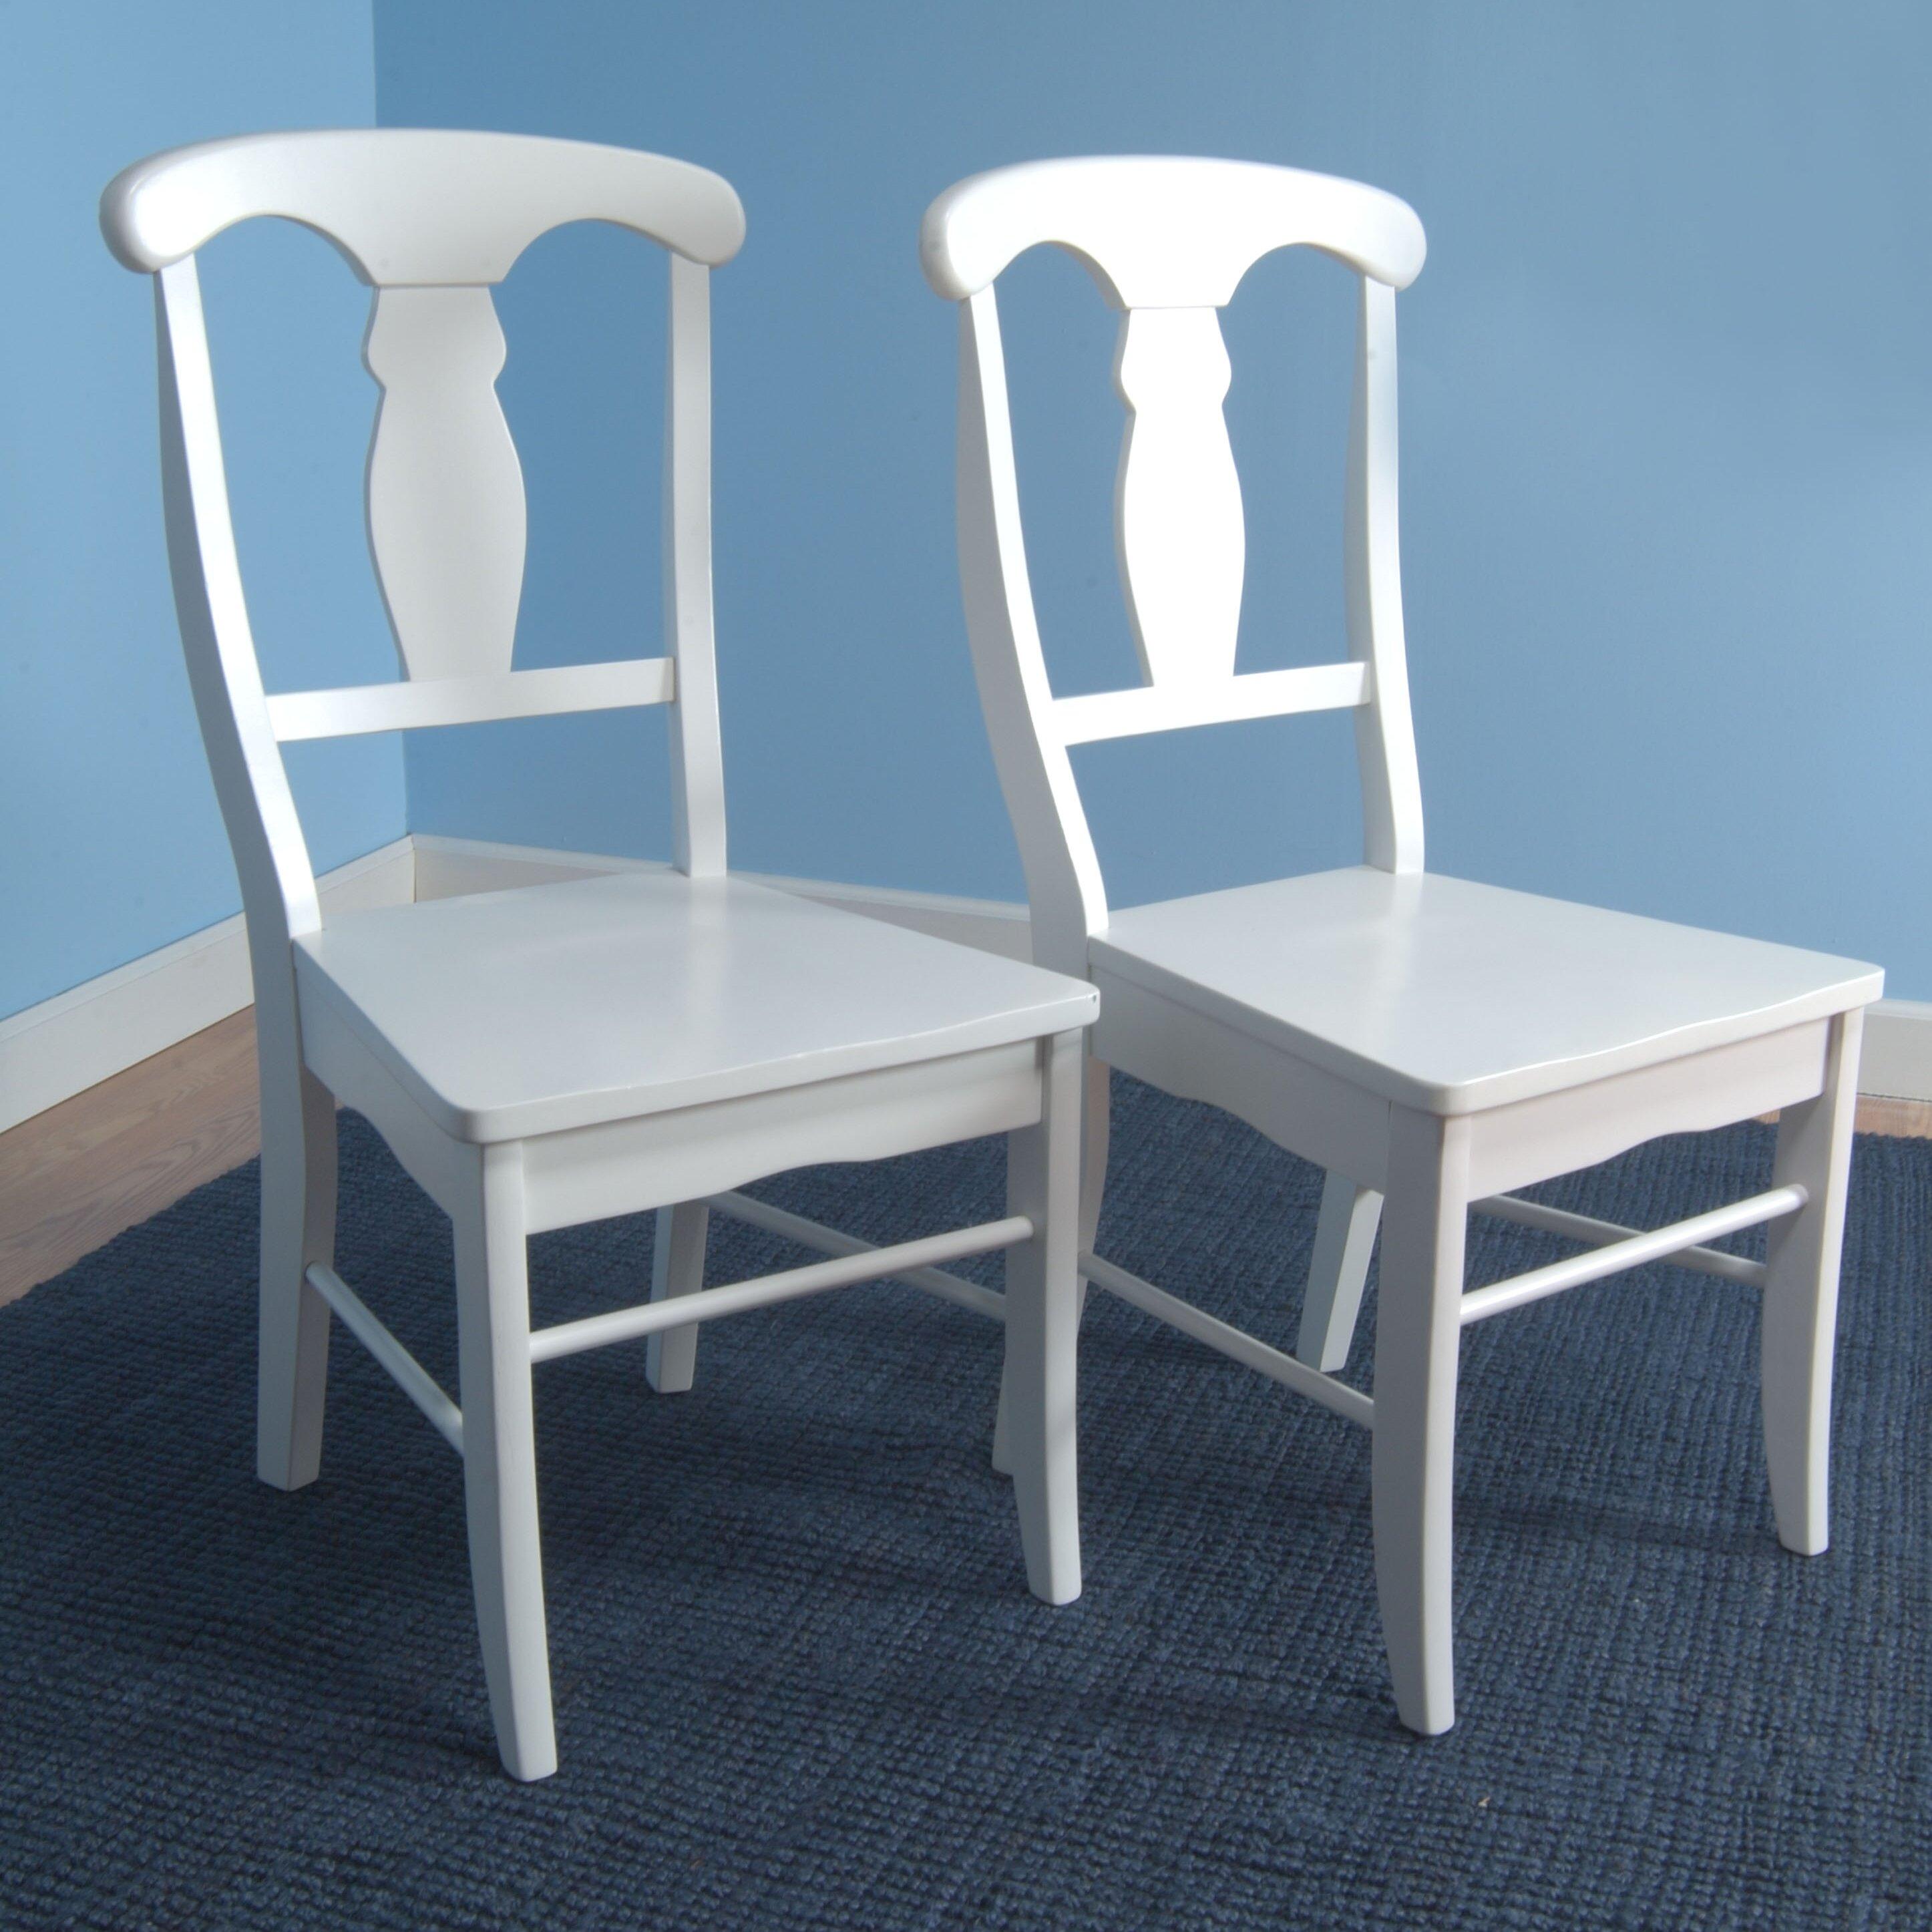 tms empire side chair reviews wayfair. Black Bedroom Furniture Sets. Home Design Ideas